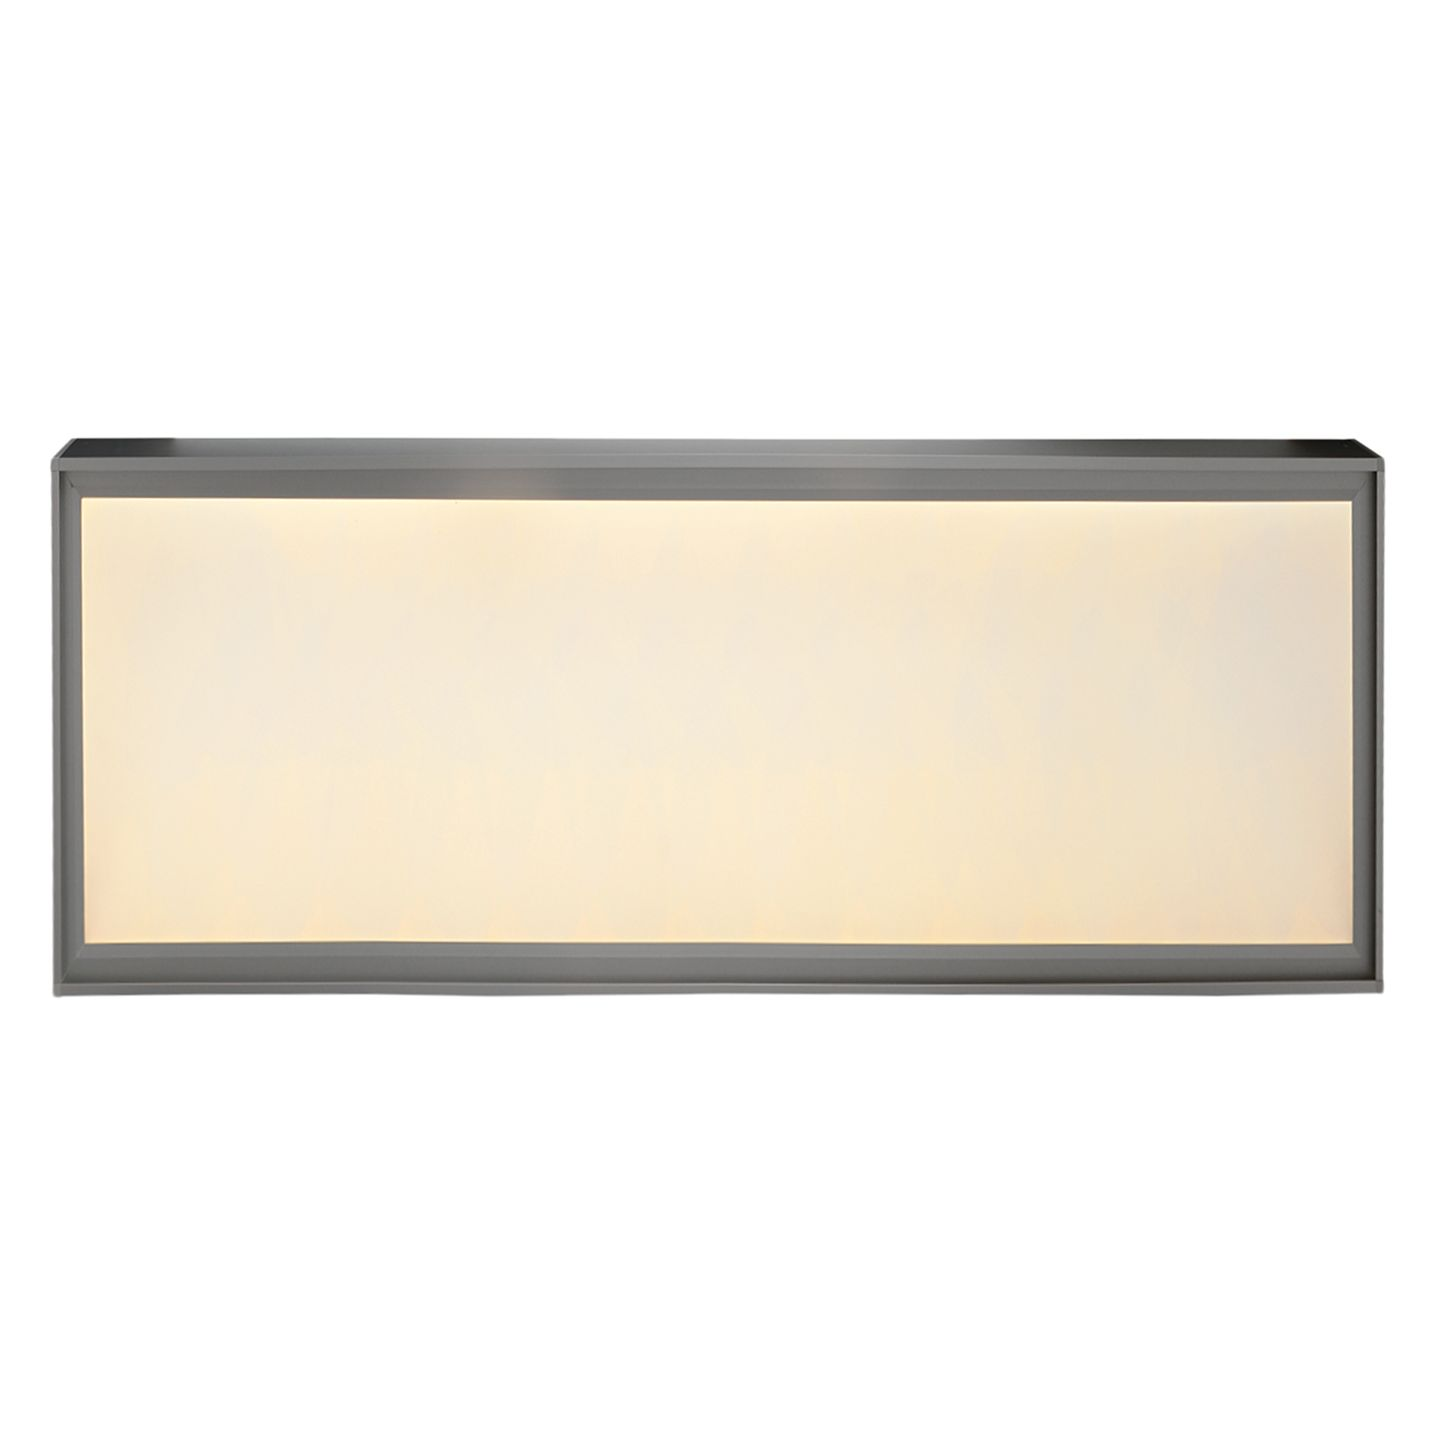 home24 LED-Deckenleuchte Diversity I